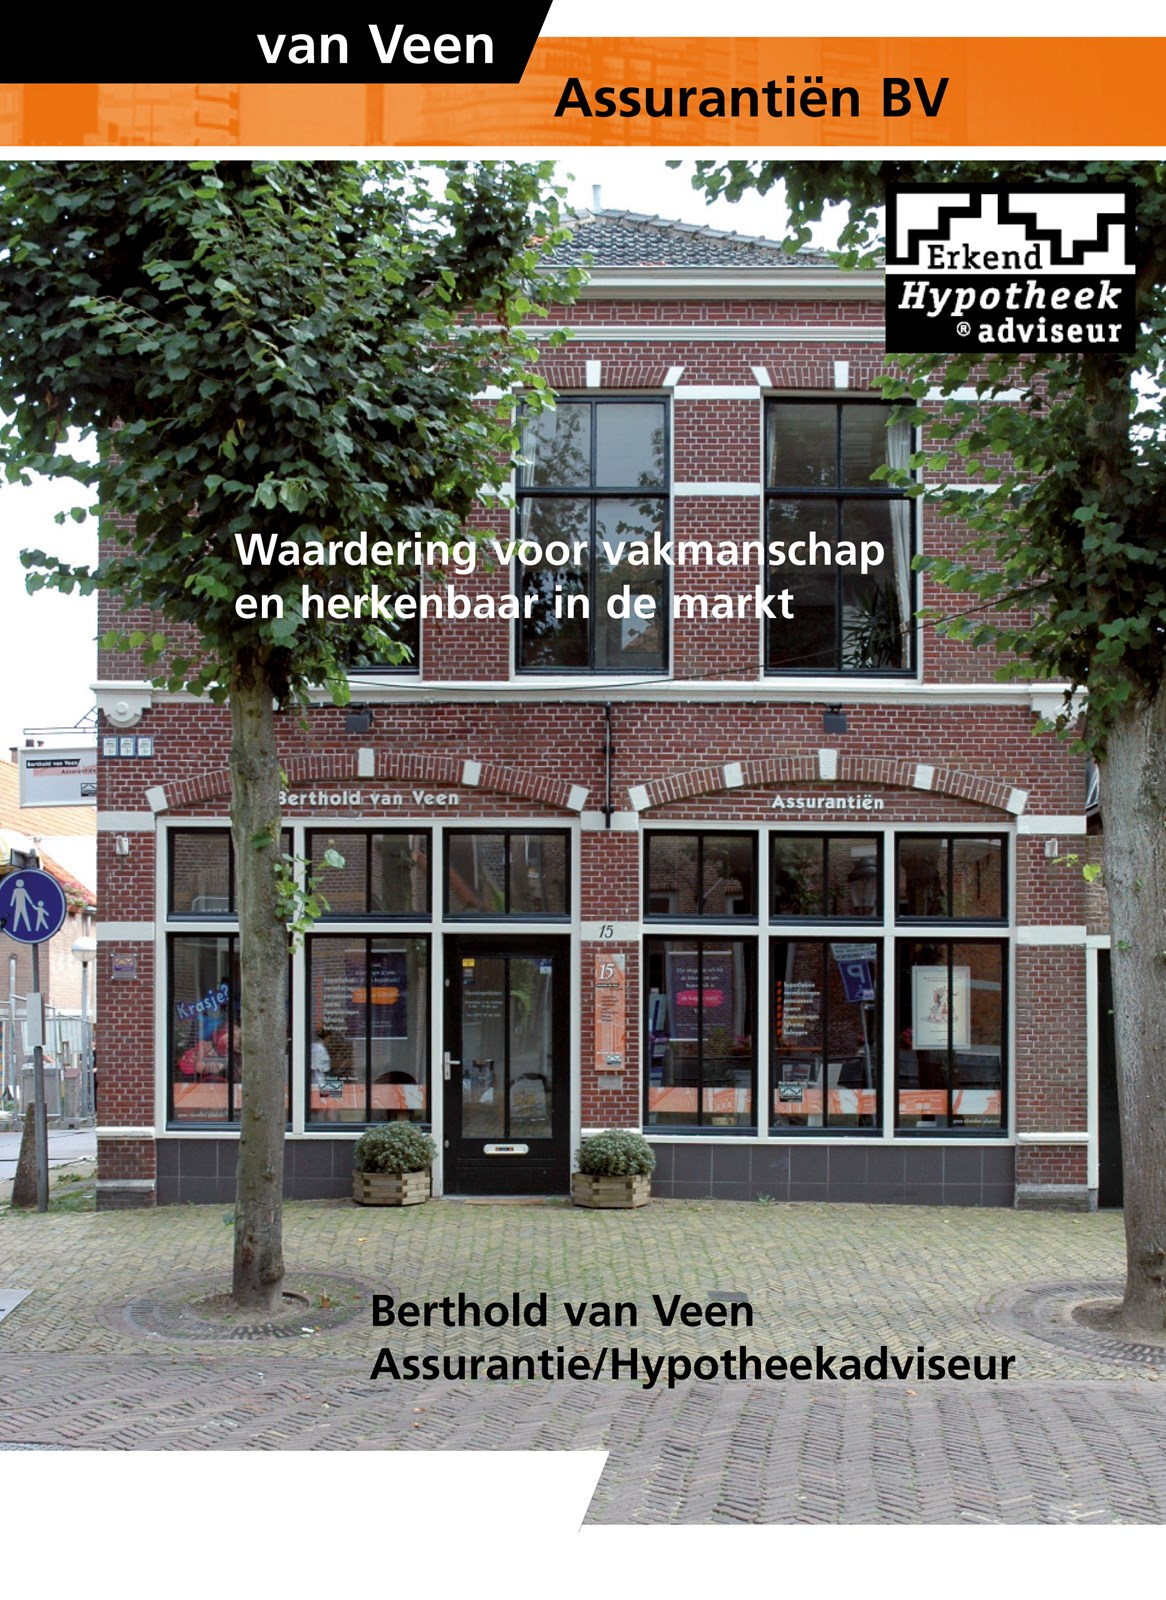 Van Veen Assurantiën & Hypotheken B.V.